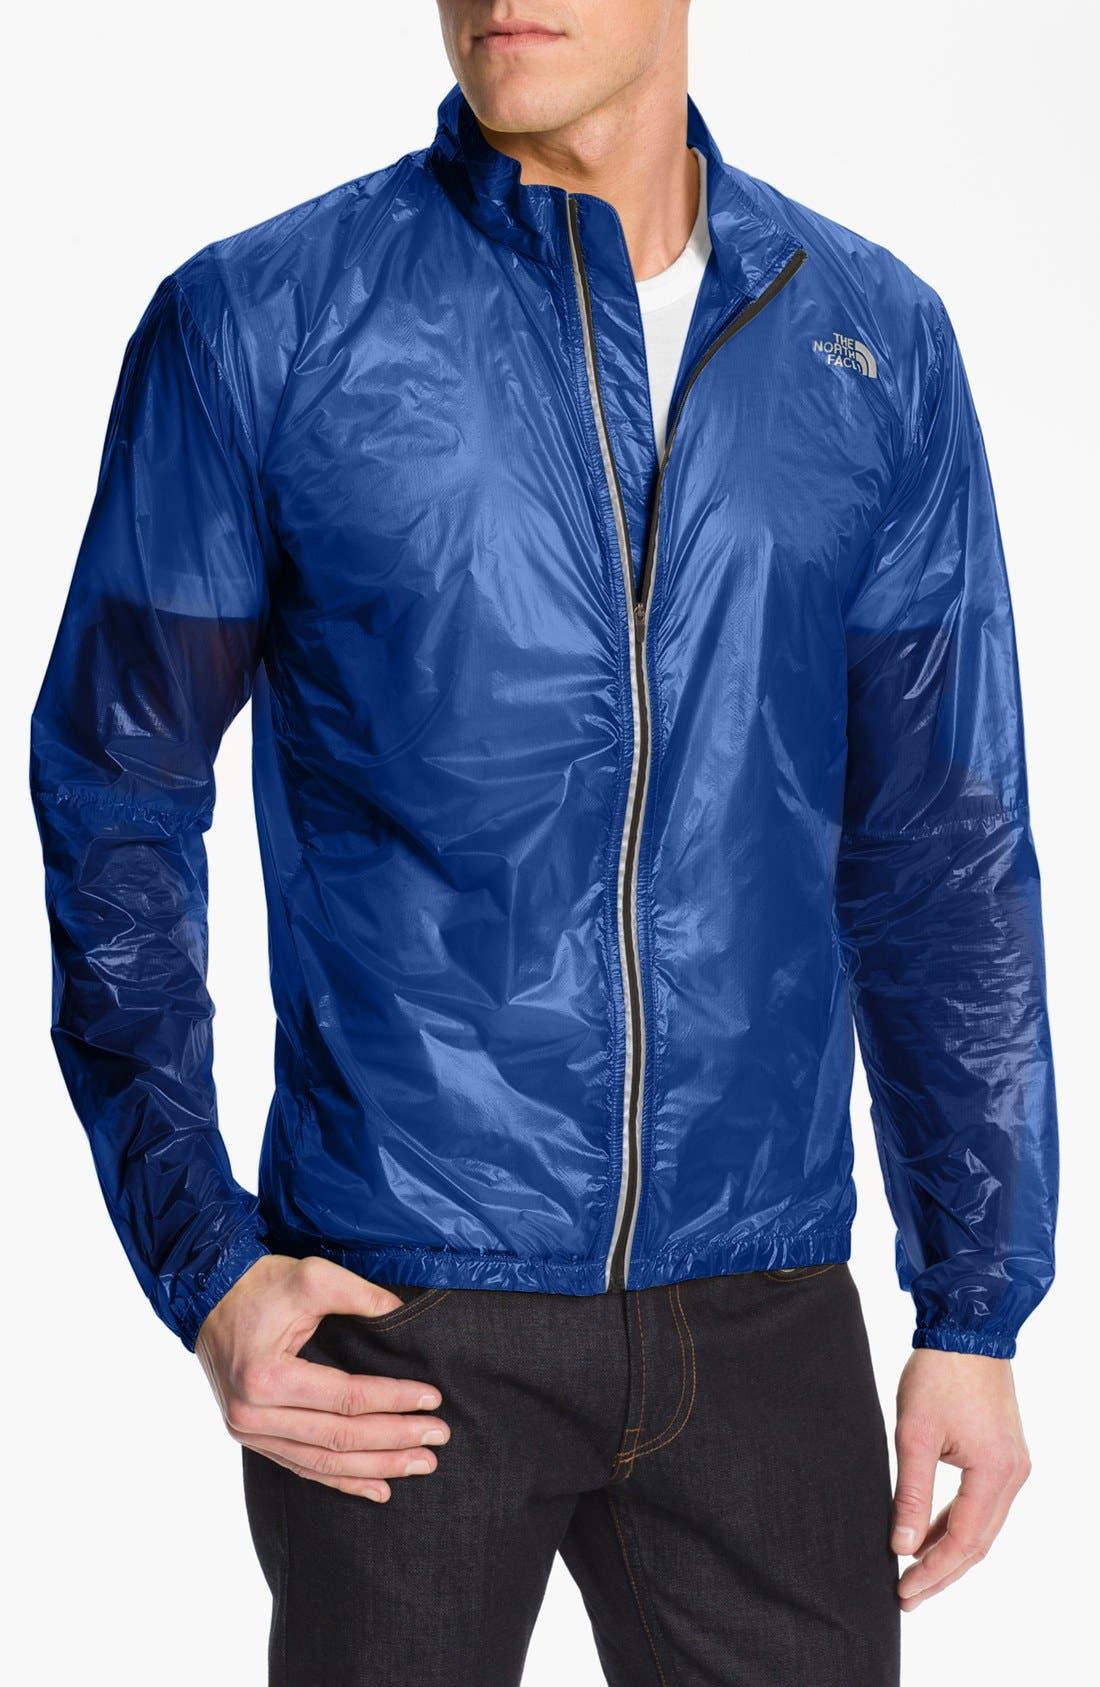 Main Image - The North Face 'Accomack' Lightweight Jacket